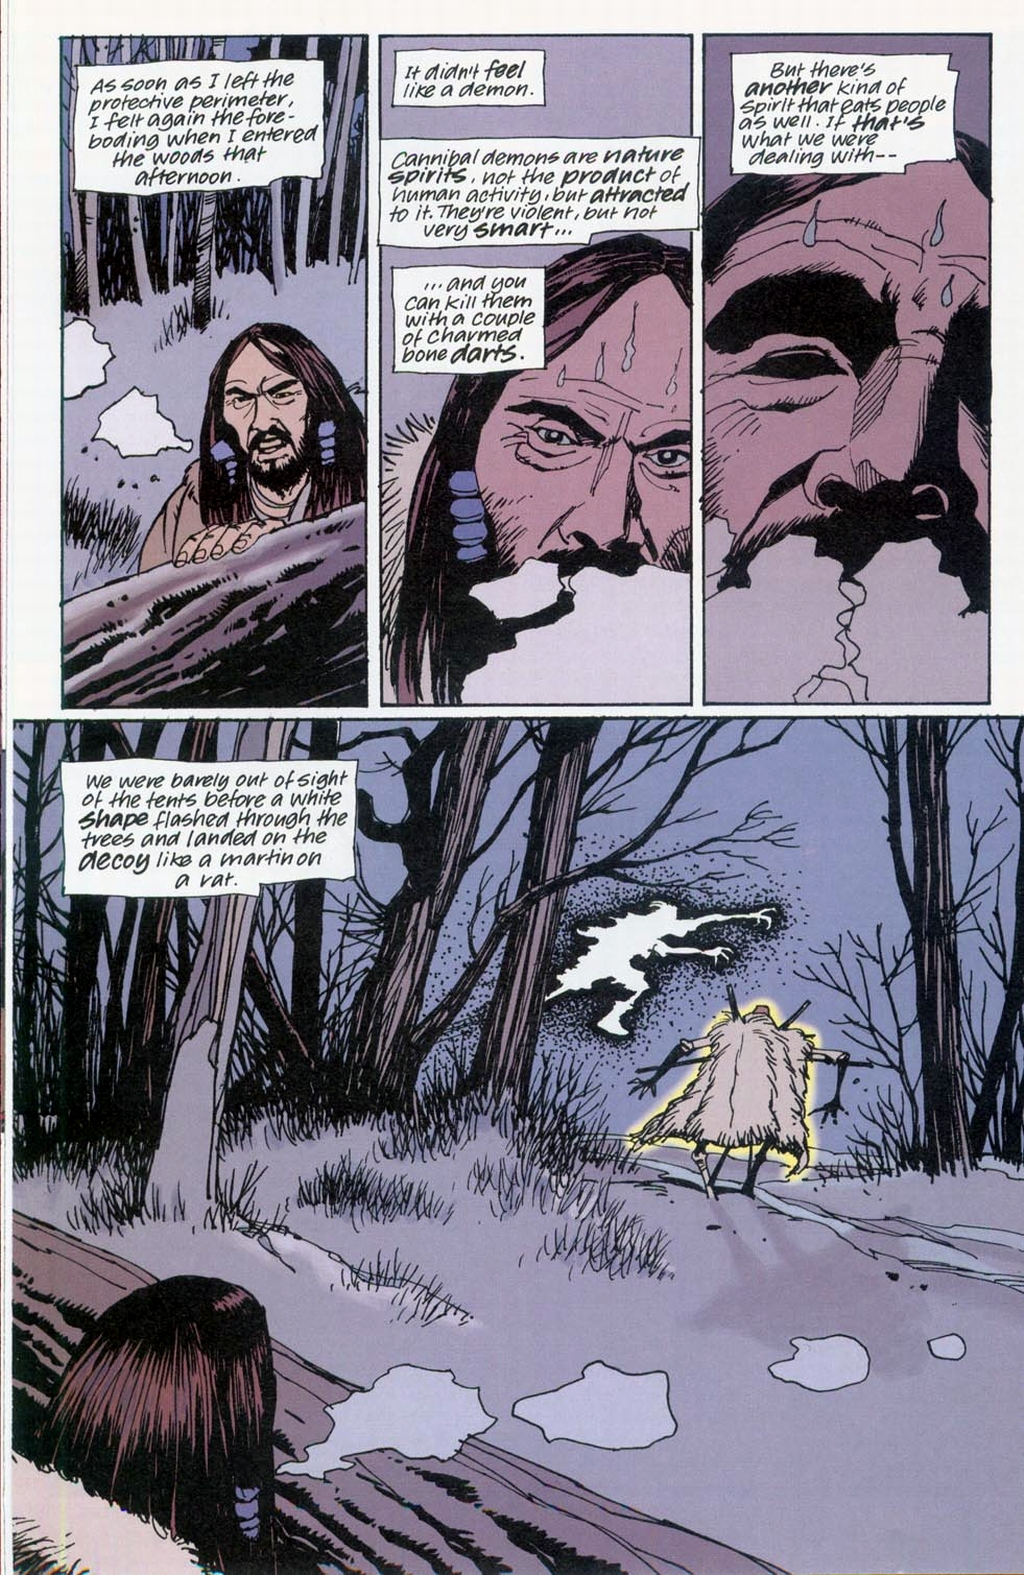 Muktuk Wolfsbreath: Hard-Boiled Shaman issue 1 - Page 14